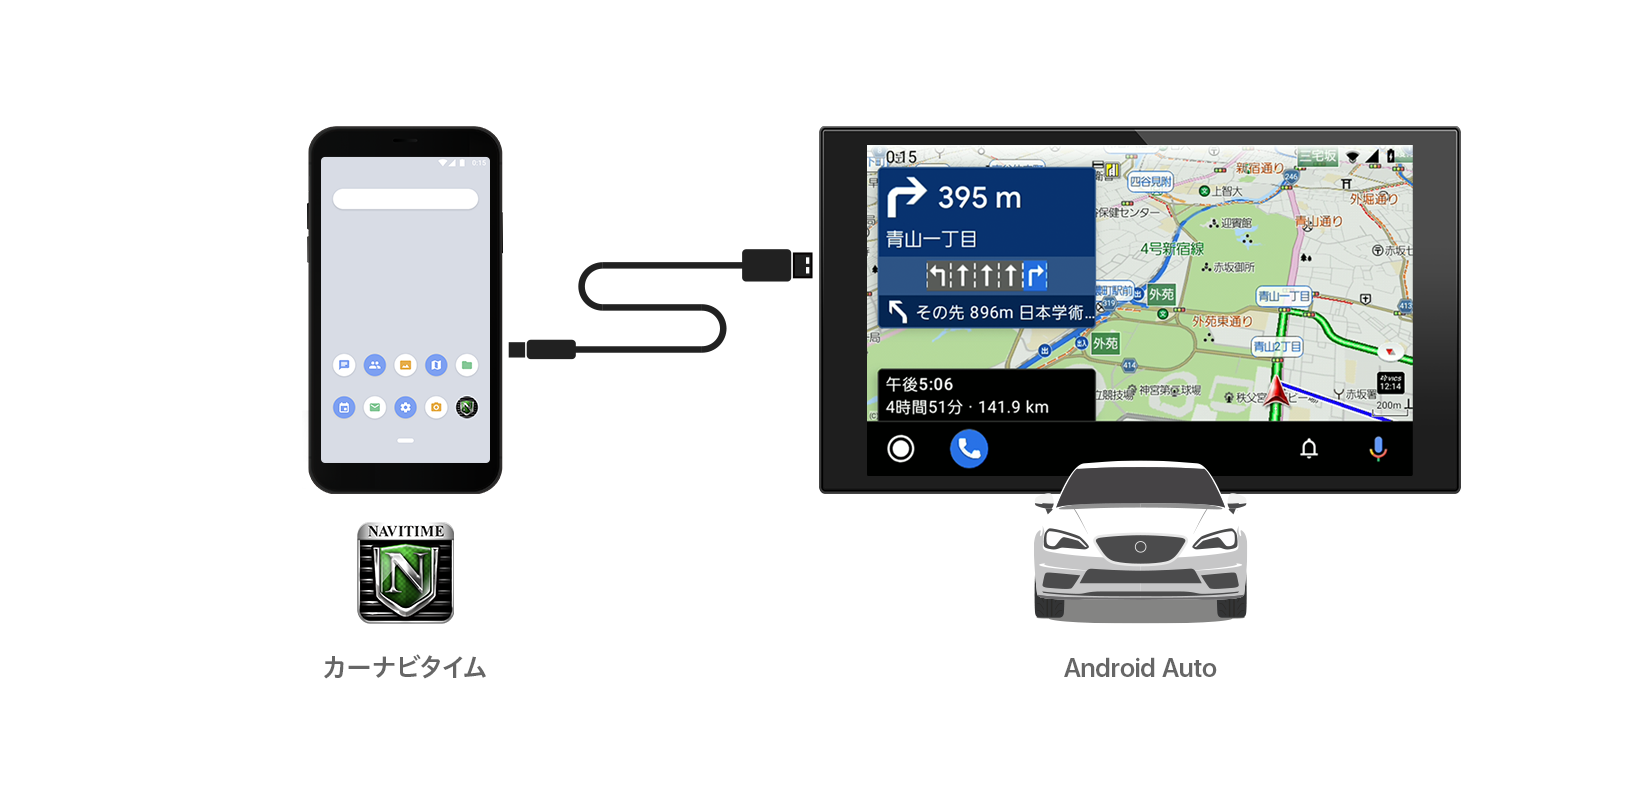 img_press_AndroidAuto.png